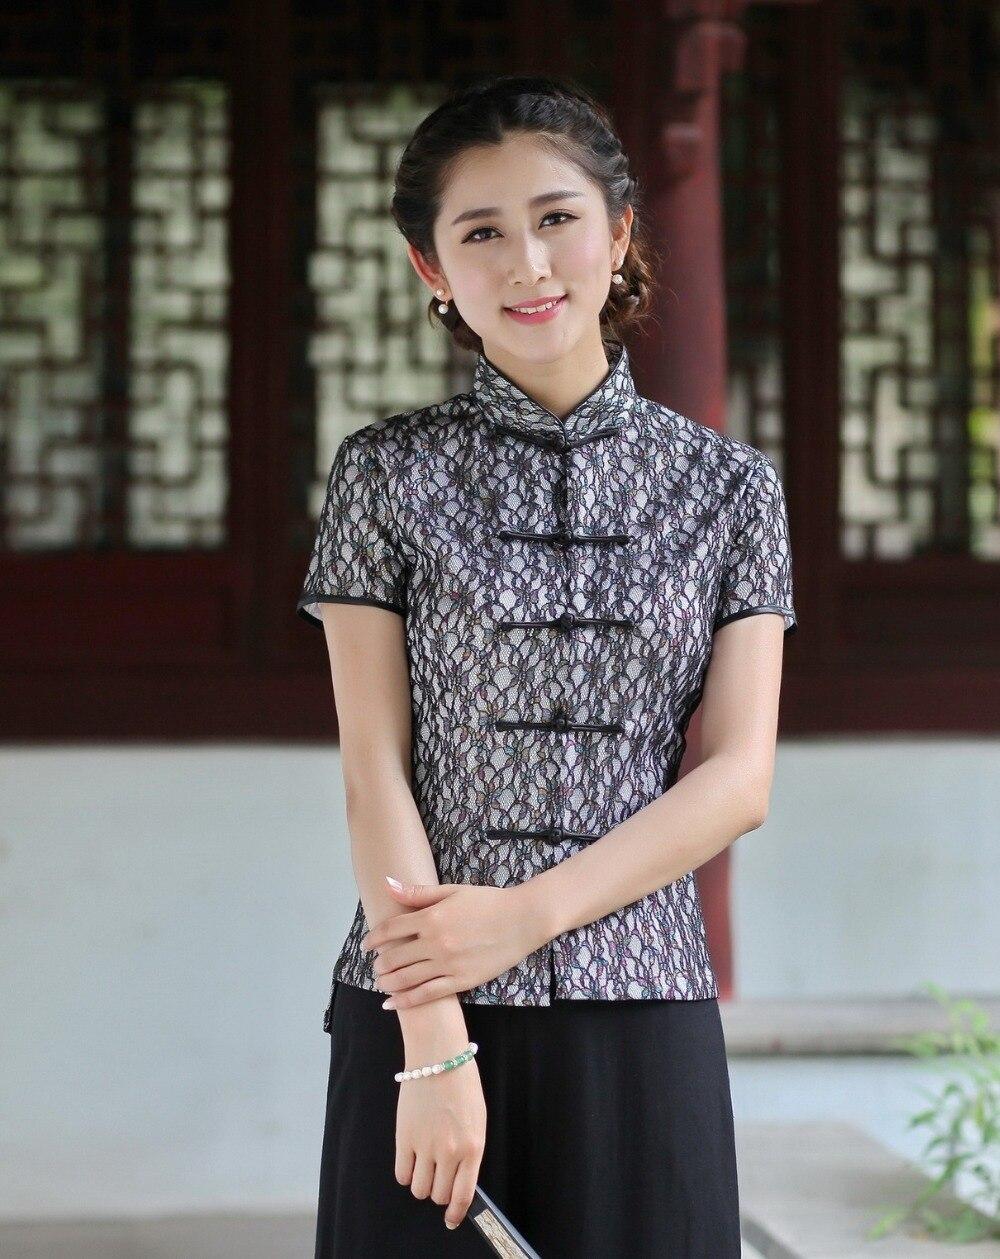 25202 25201 Blouse Chinois Cheongsam Option Tops Traditionnel Histoire Style 2520 En Tradition Dentelle Top 25203 5 Coton Shanghai 25204 25205 zgqxaZEn